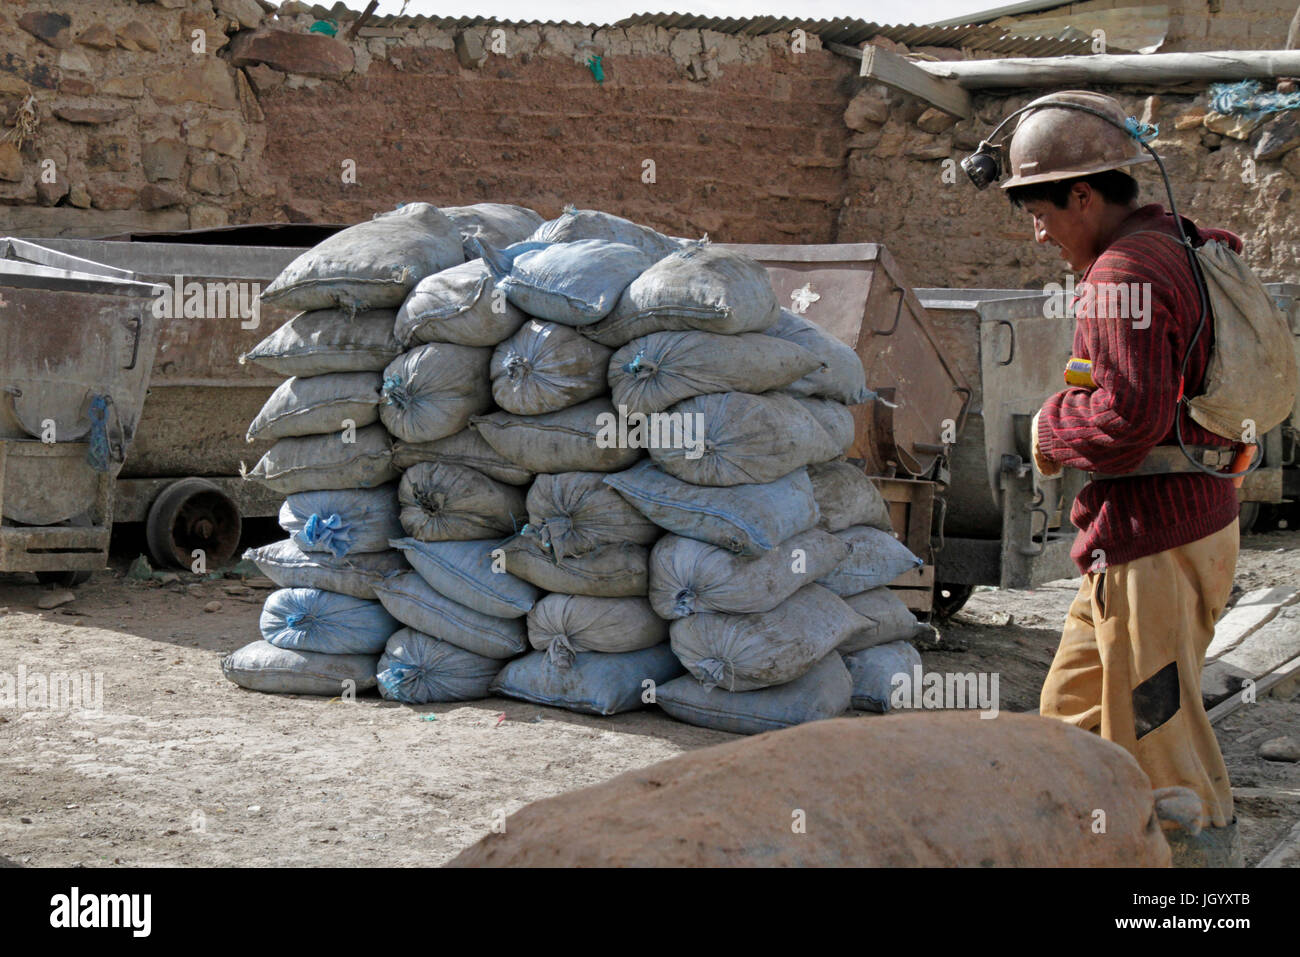 Miner starting his shift in Potosi, Bolivia - Stock Image